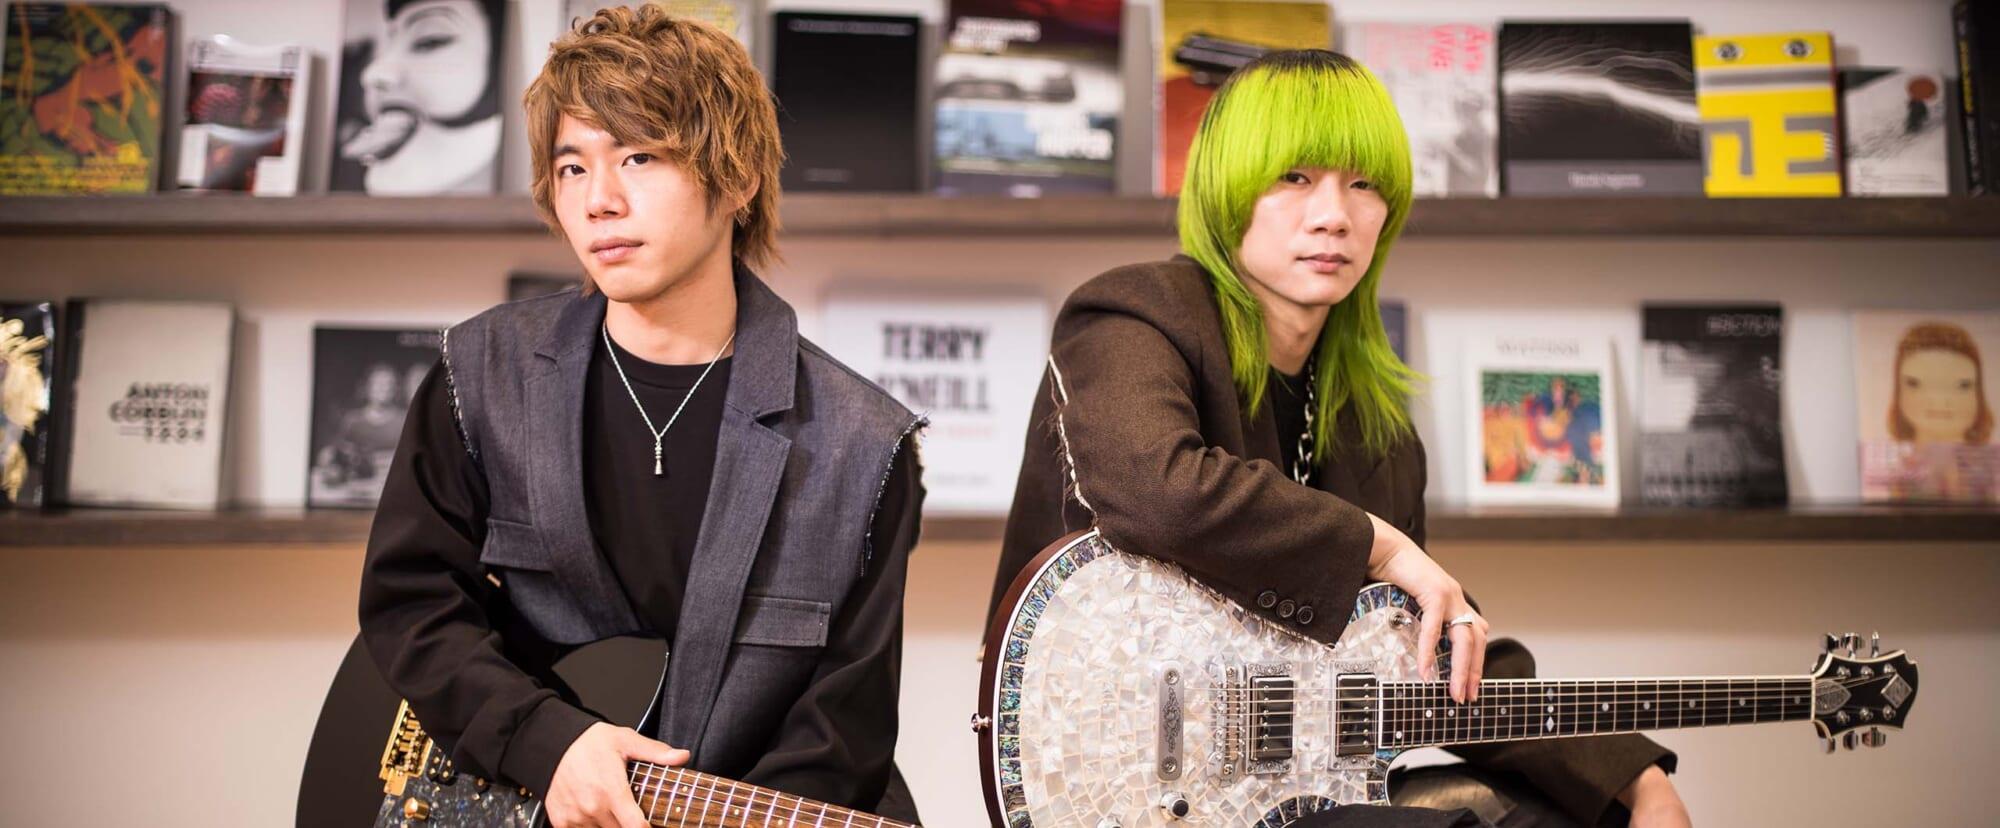 Interview|沖聡次郎&山田海斗による骨太ツイン・ギターが告げる『開幕宣言』